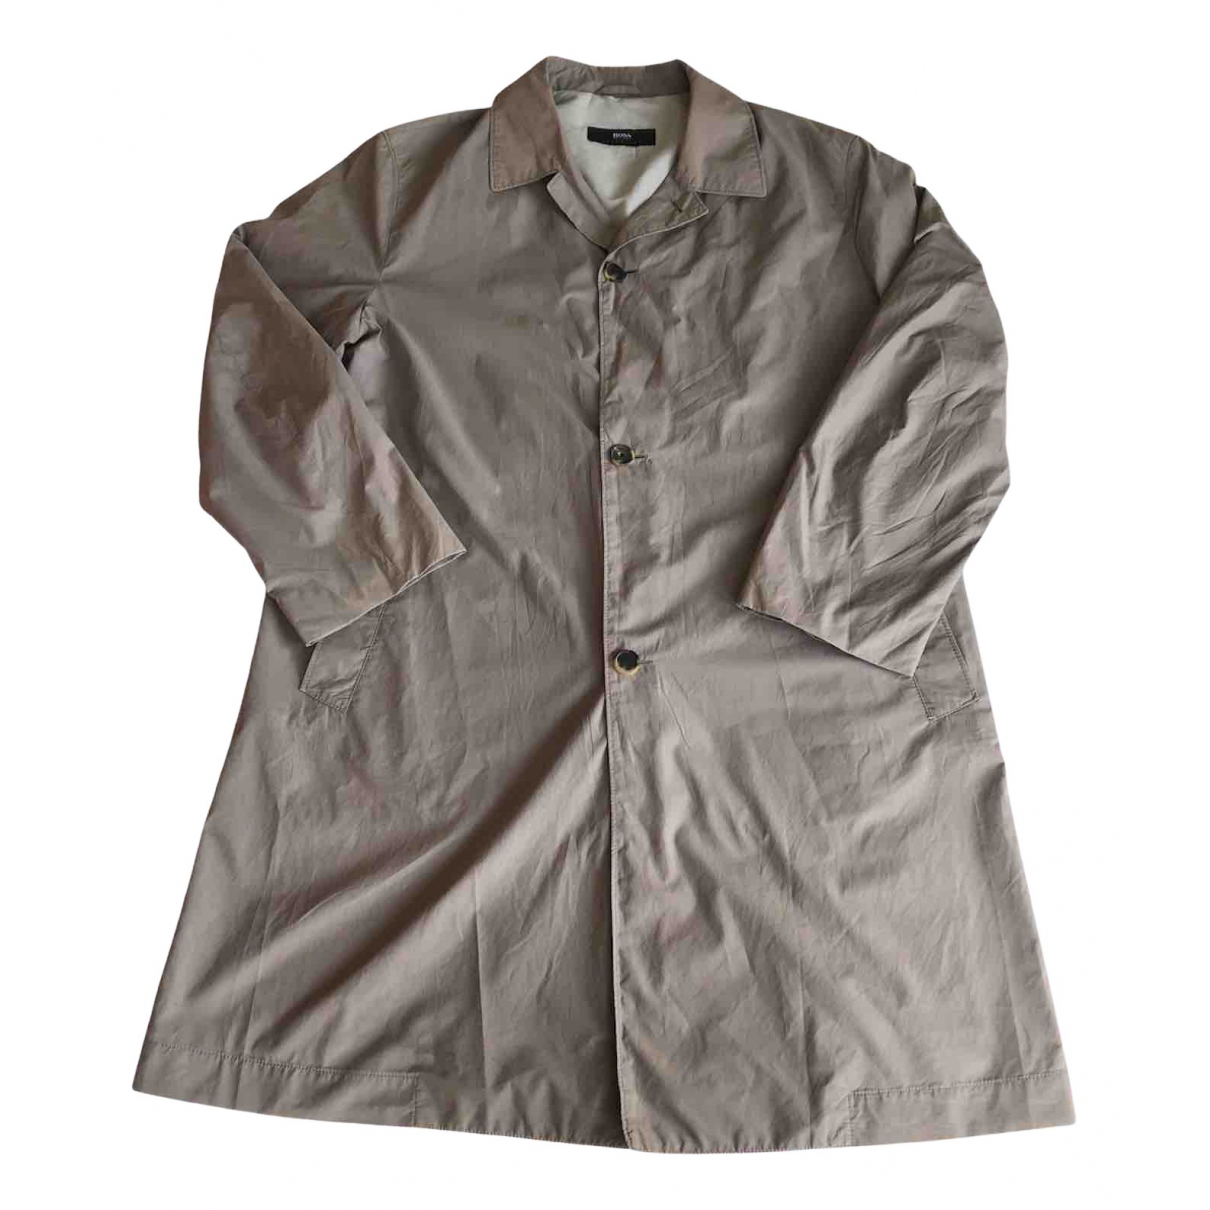 Hugo Boss N Grey jacket  for Men 44 UK - US